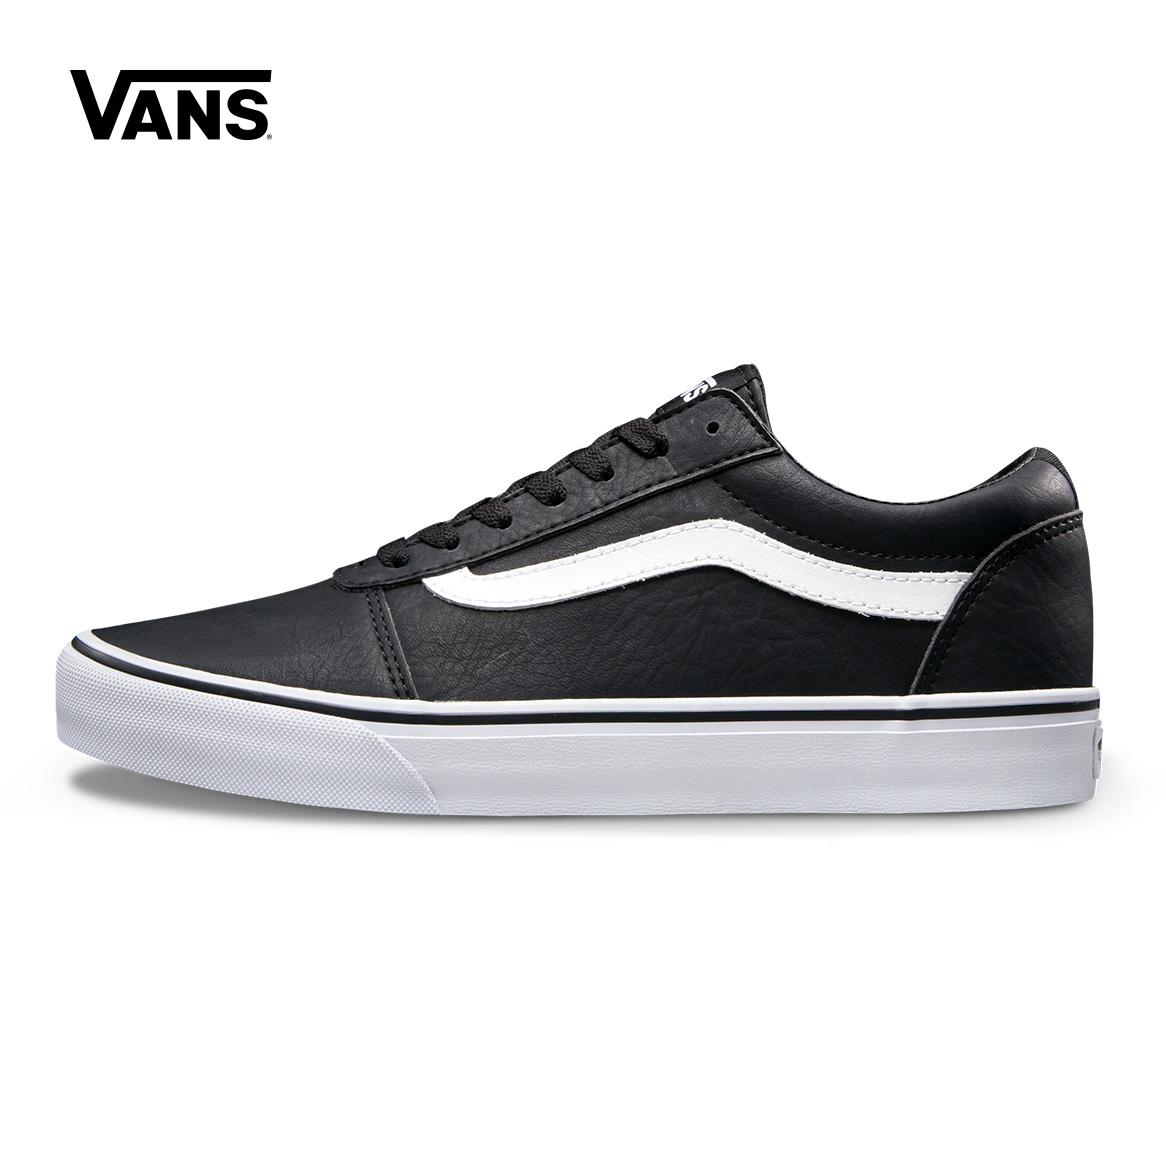 Vans 范斯官方男款侧边条纹休闲鞋|VN0A38DMK55